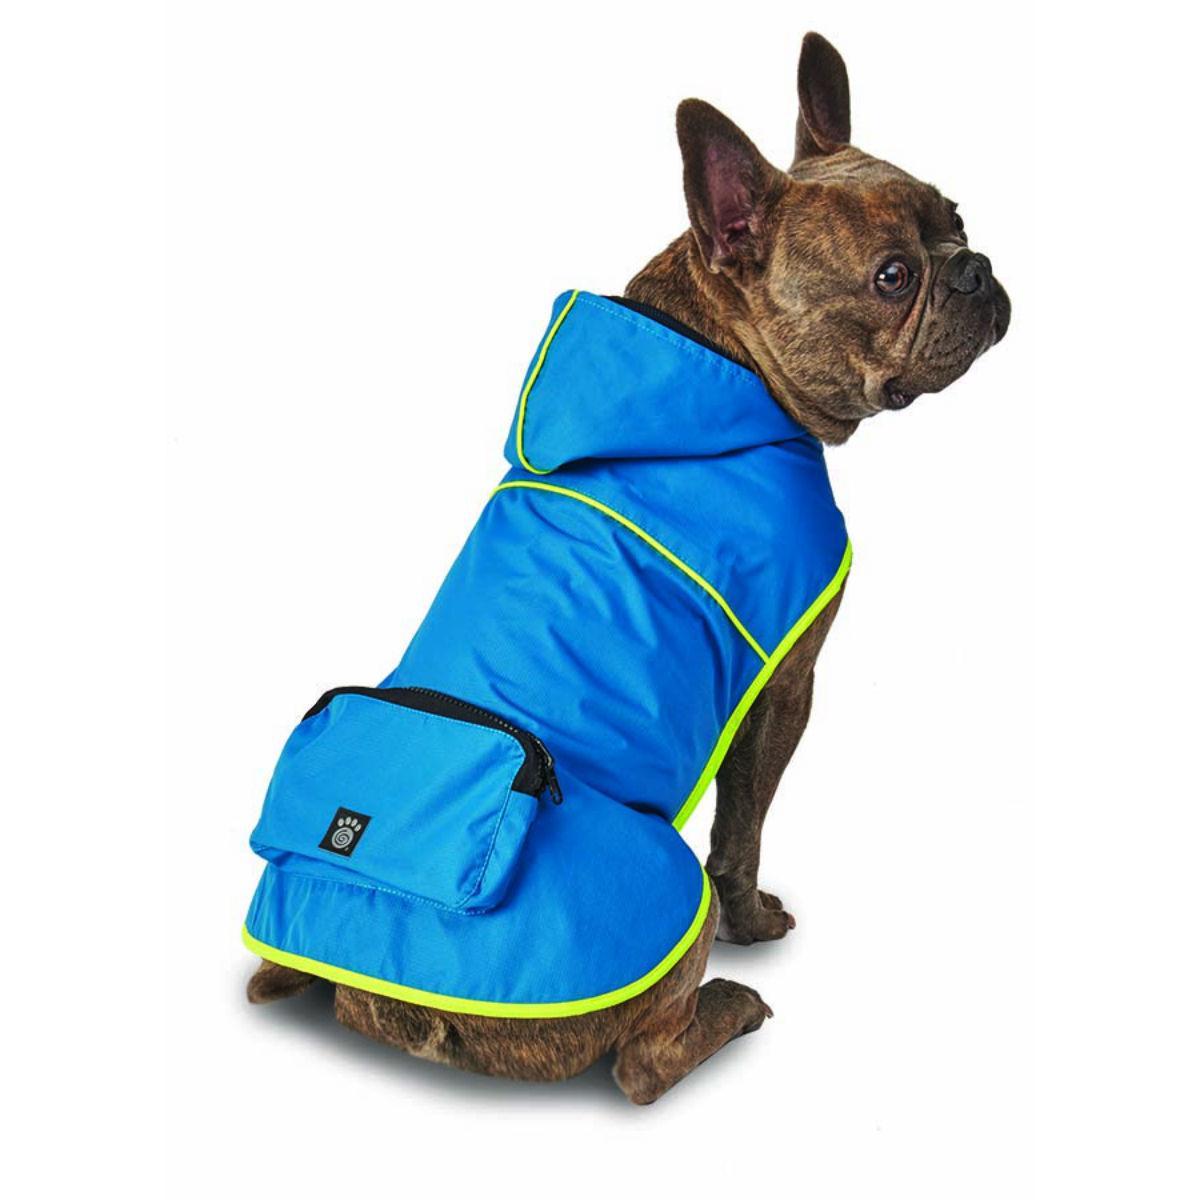 Banff Packable Rain Dog Jacket - Teal